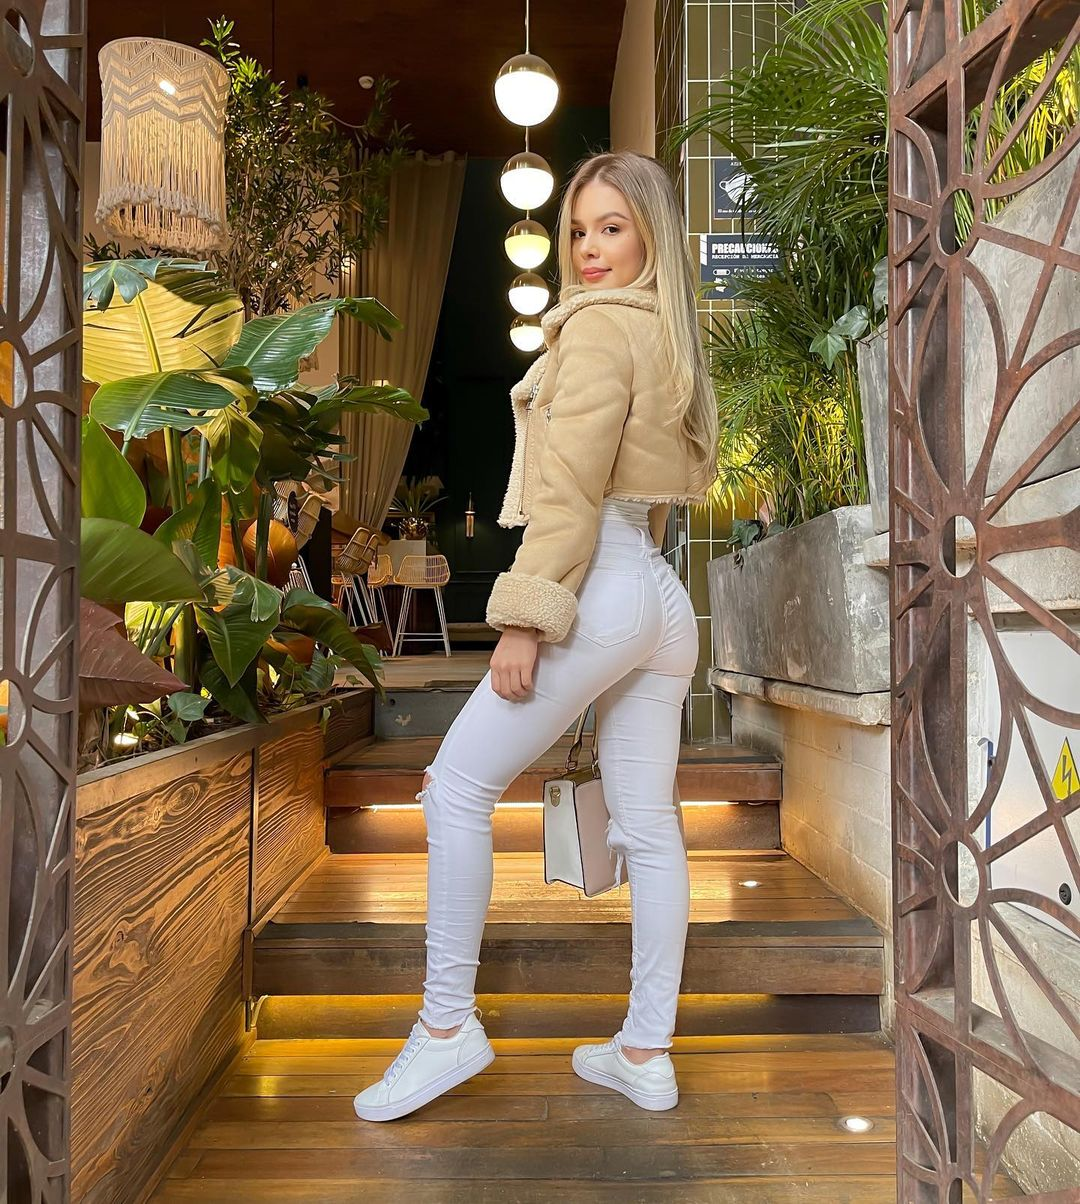 Luisa-Duque-Wallpapers-Insta-Fit-Bio-2